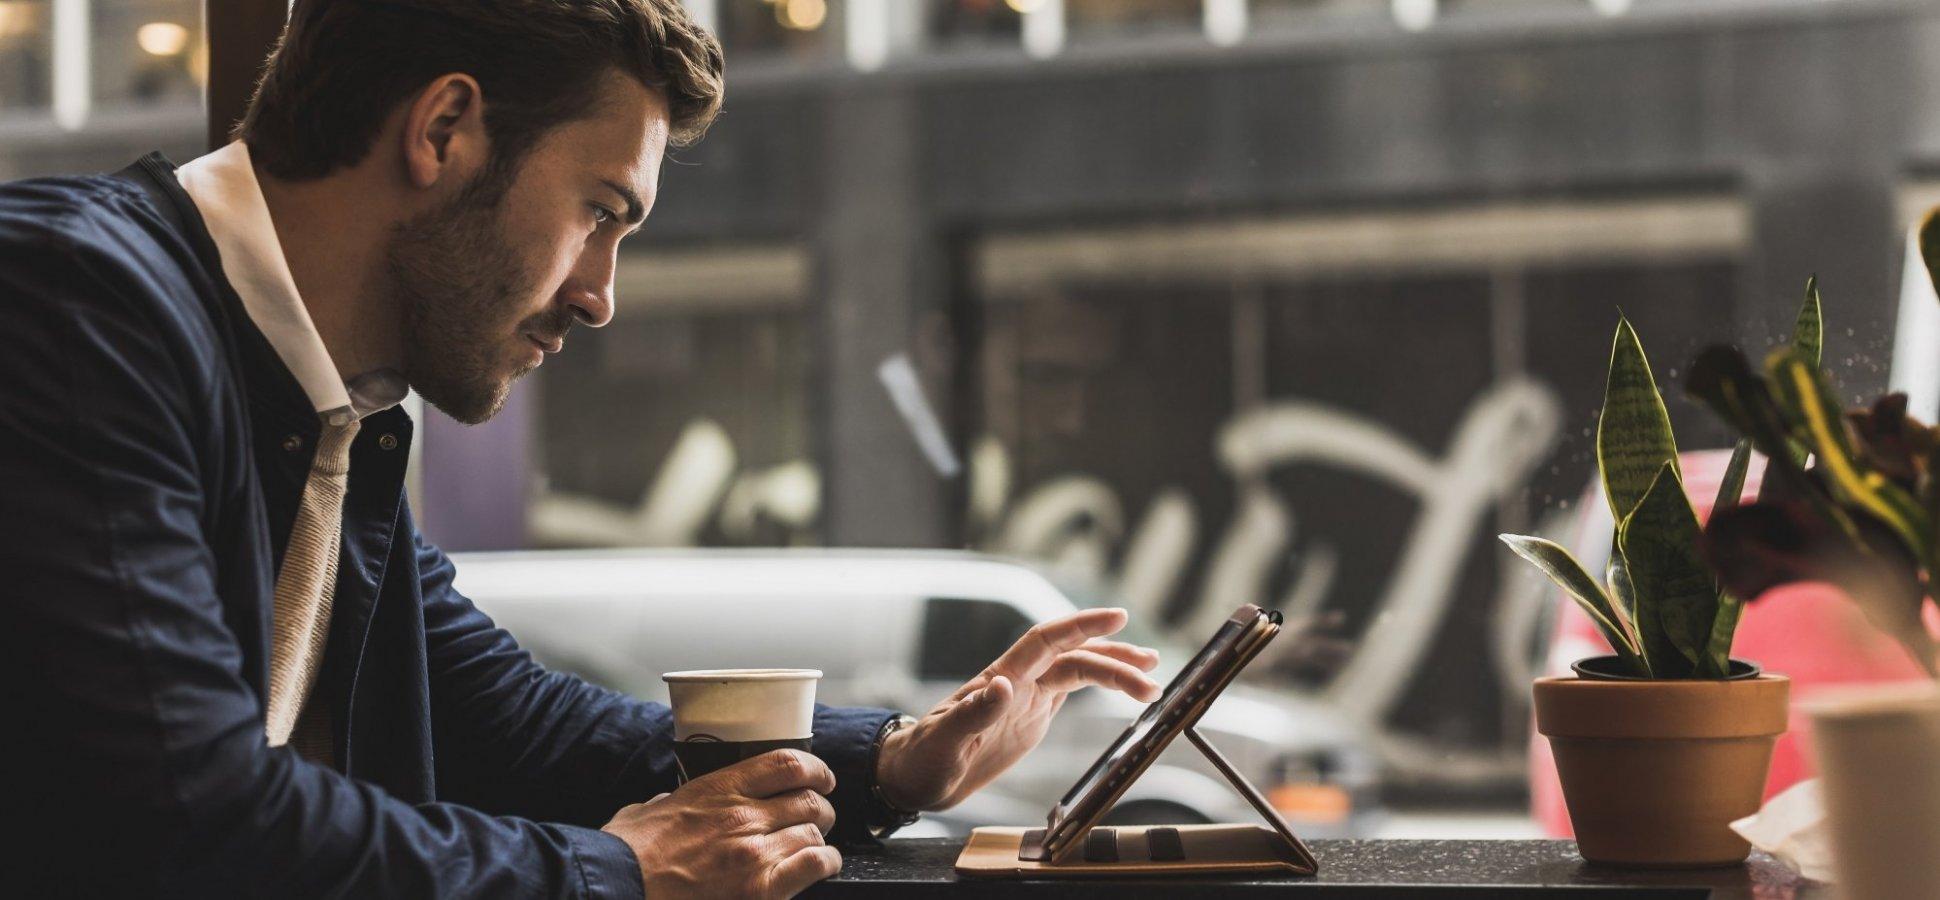 7 Ways to Dramatically Grow Your Email Marketing List